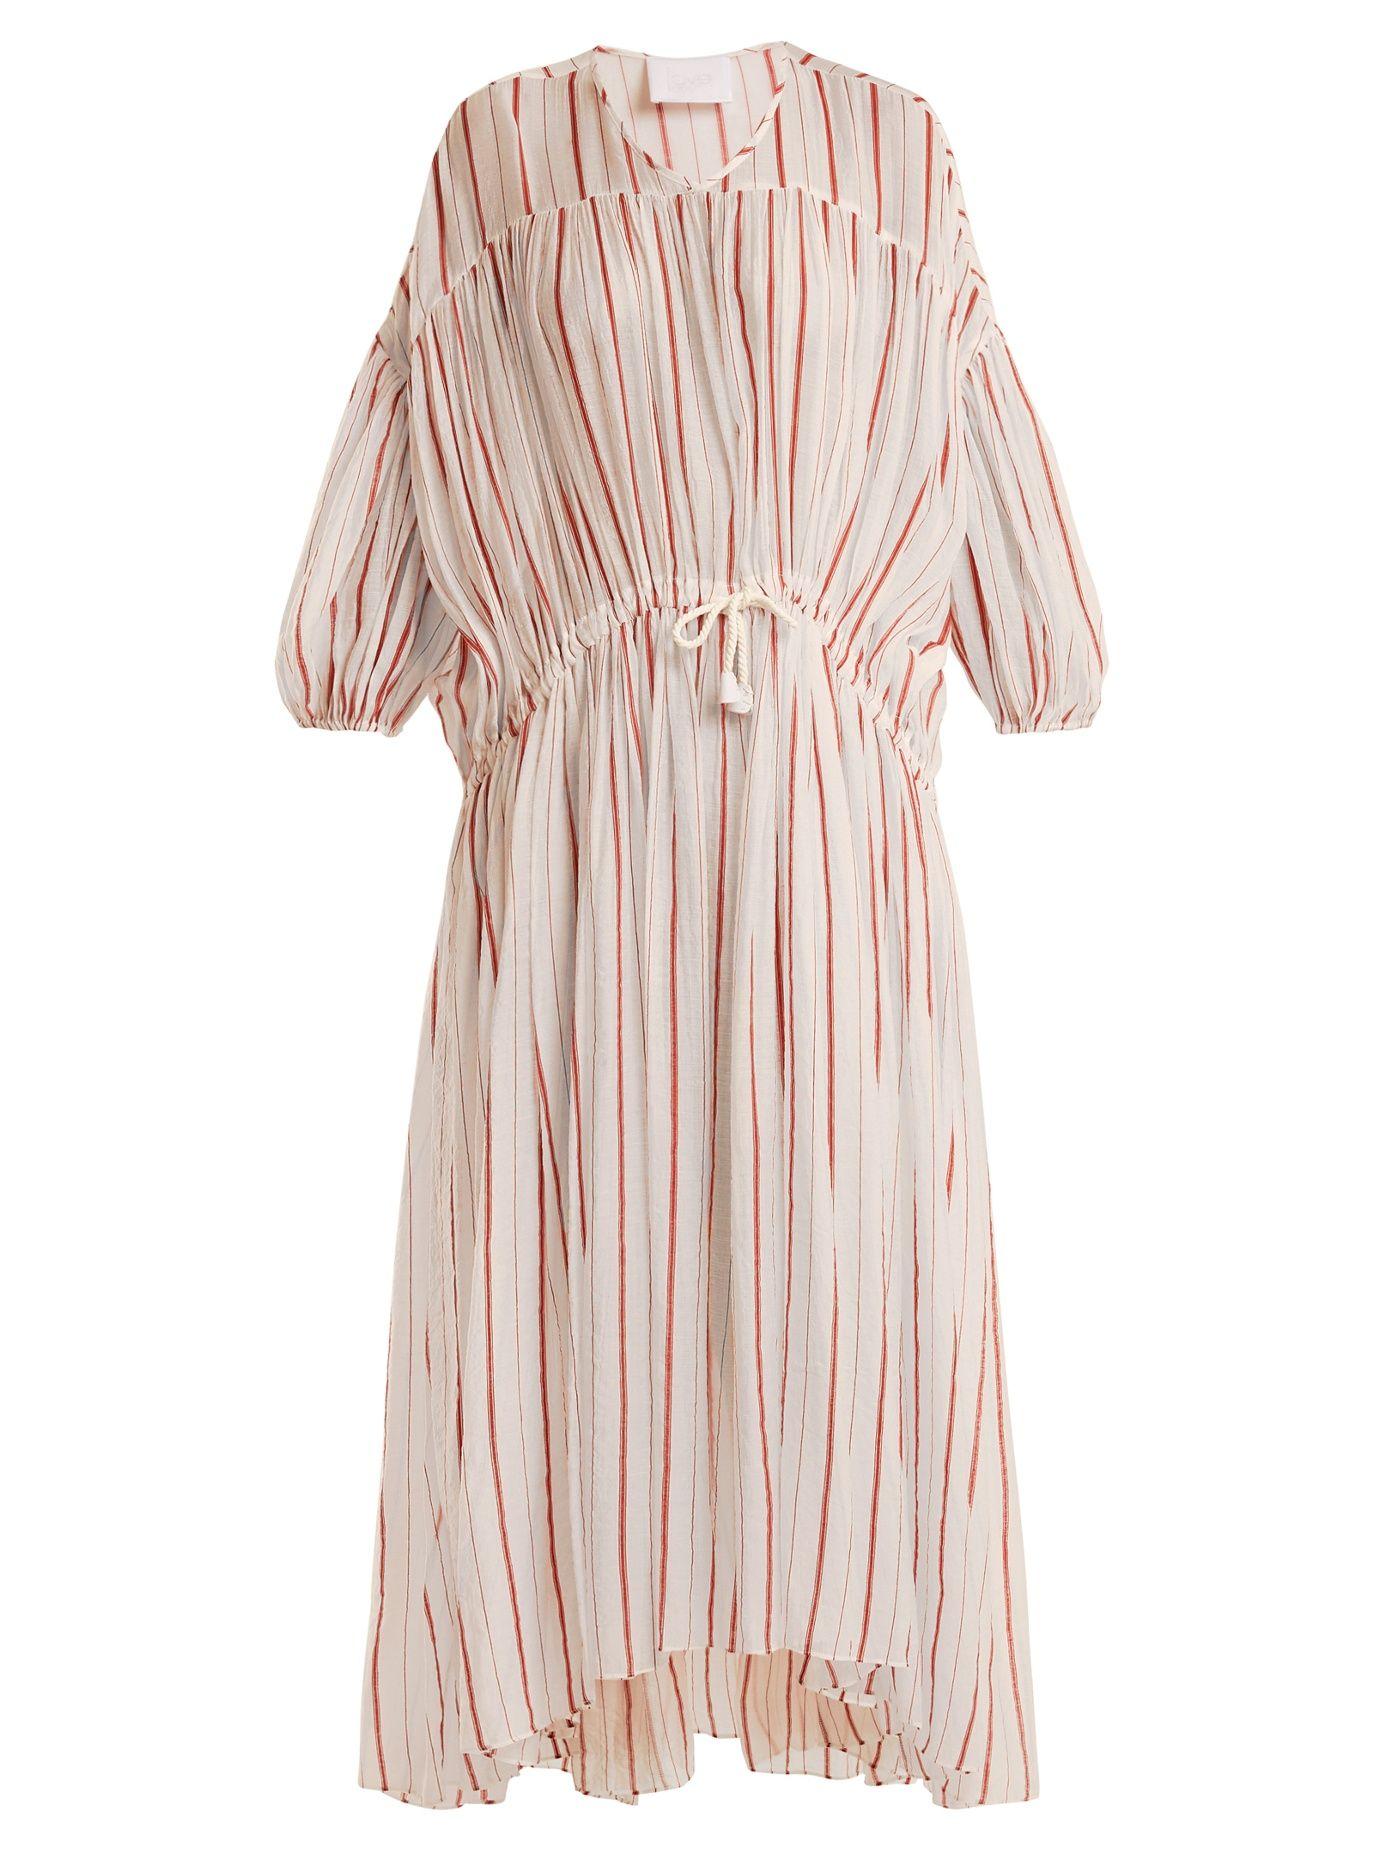 Drawstring-waist striped cotton dress Love Binetti swIER3T6